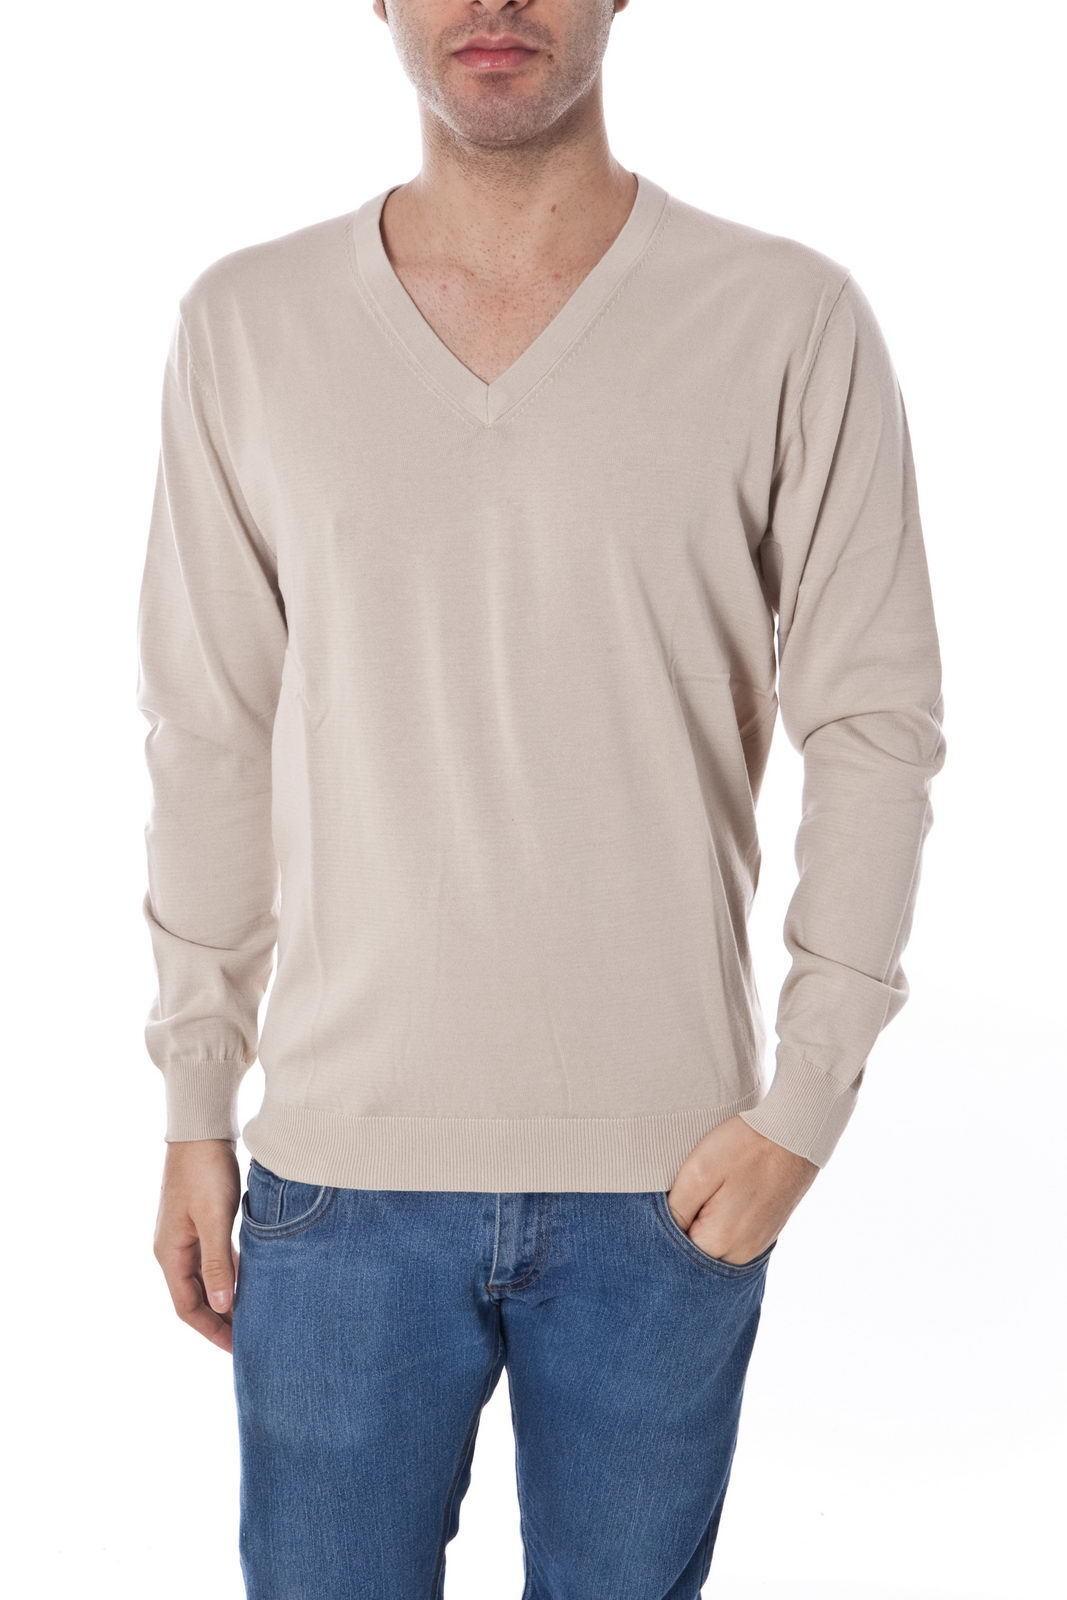 Maglia Daniele Alessandrini Sweater Cotone  Herren Beige FM52116A3300 15